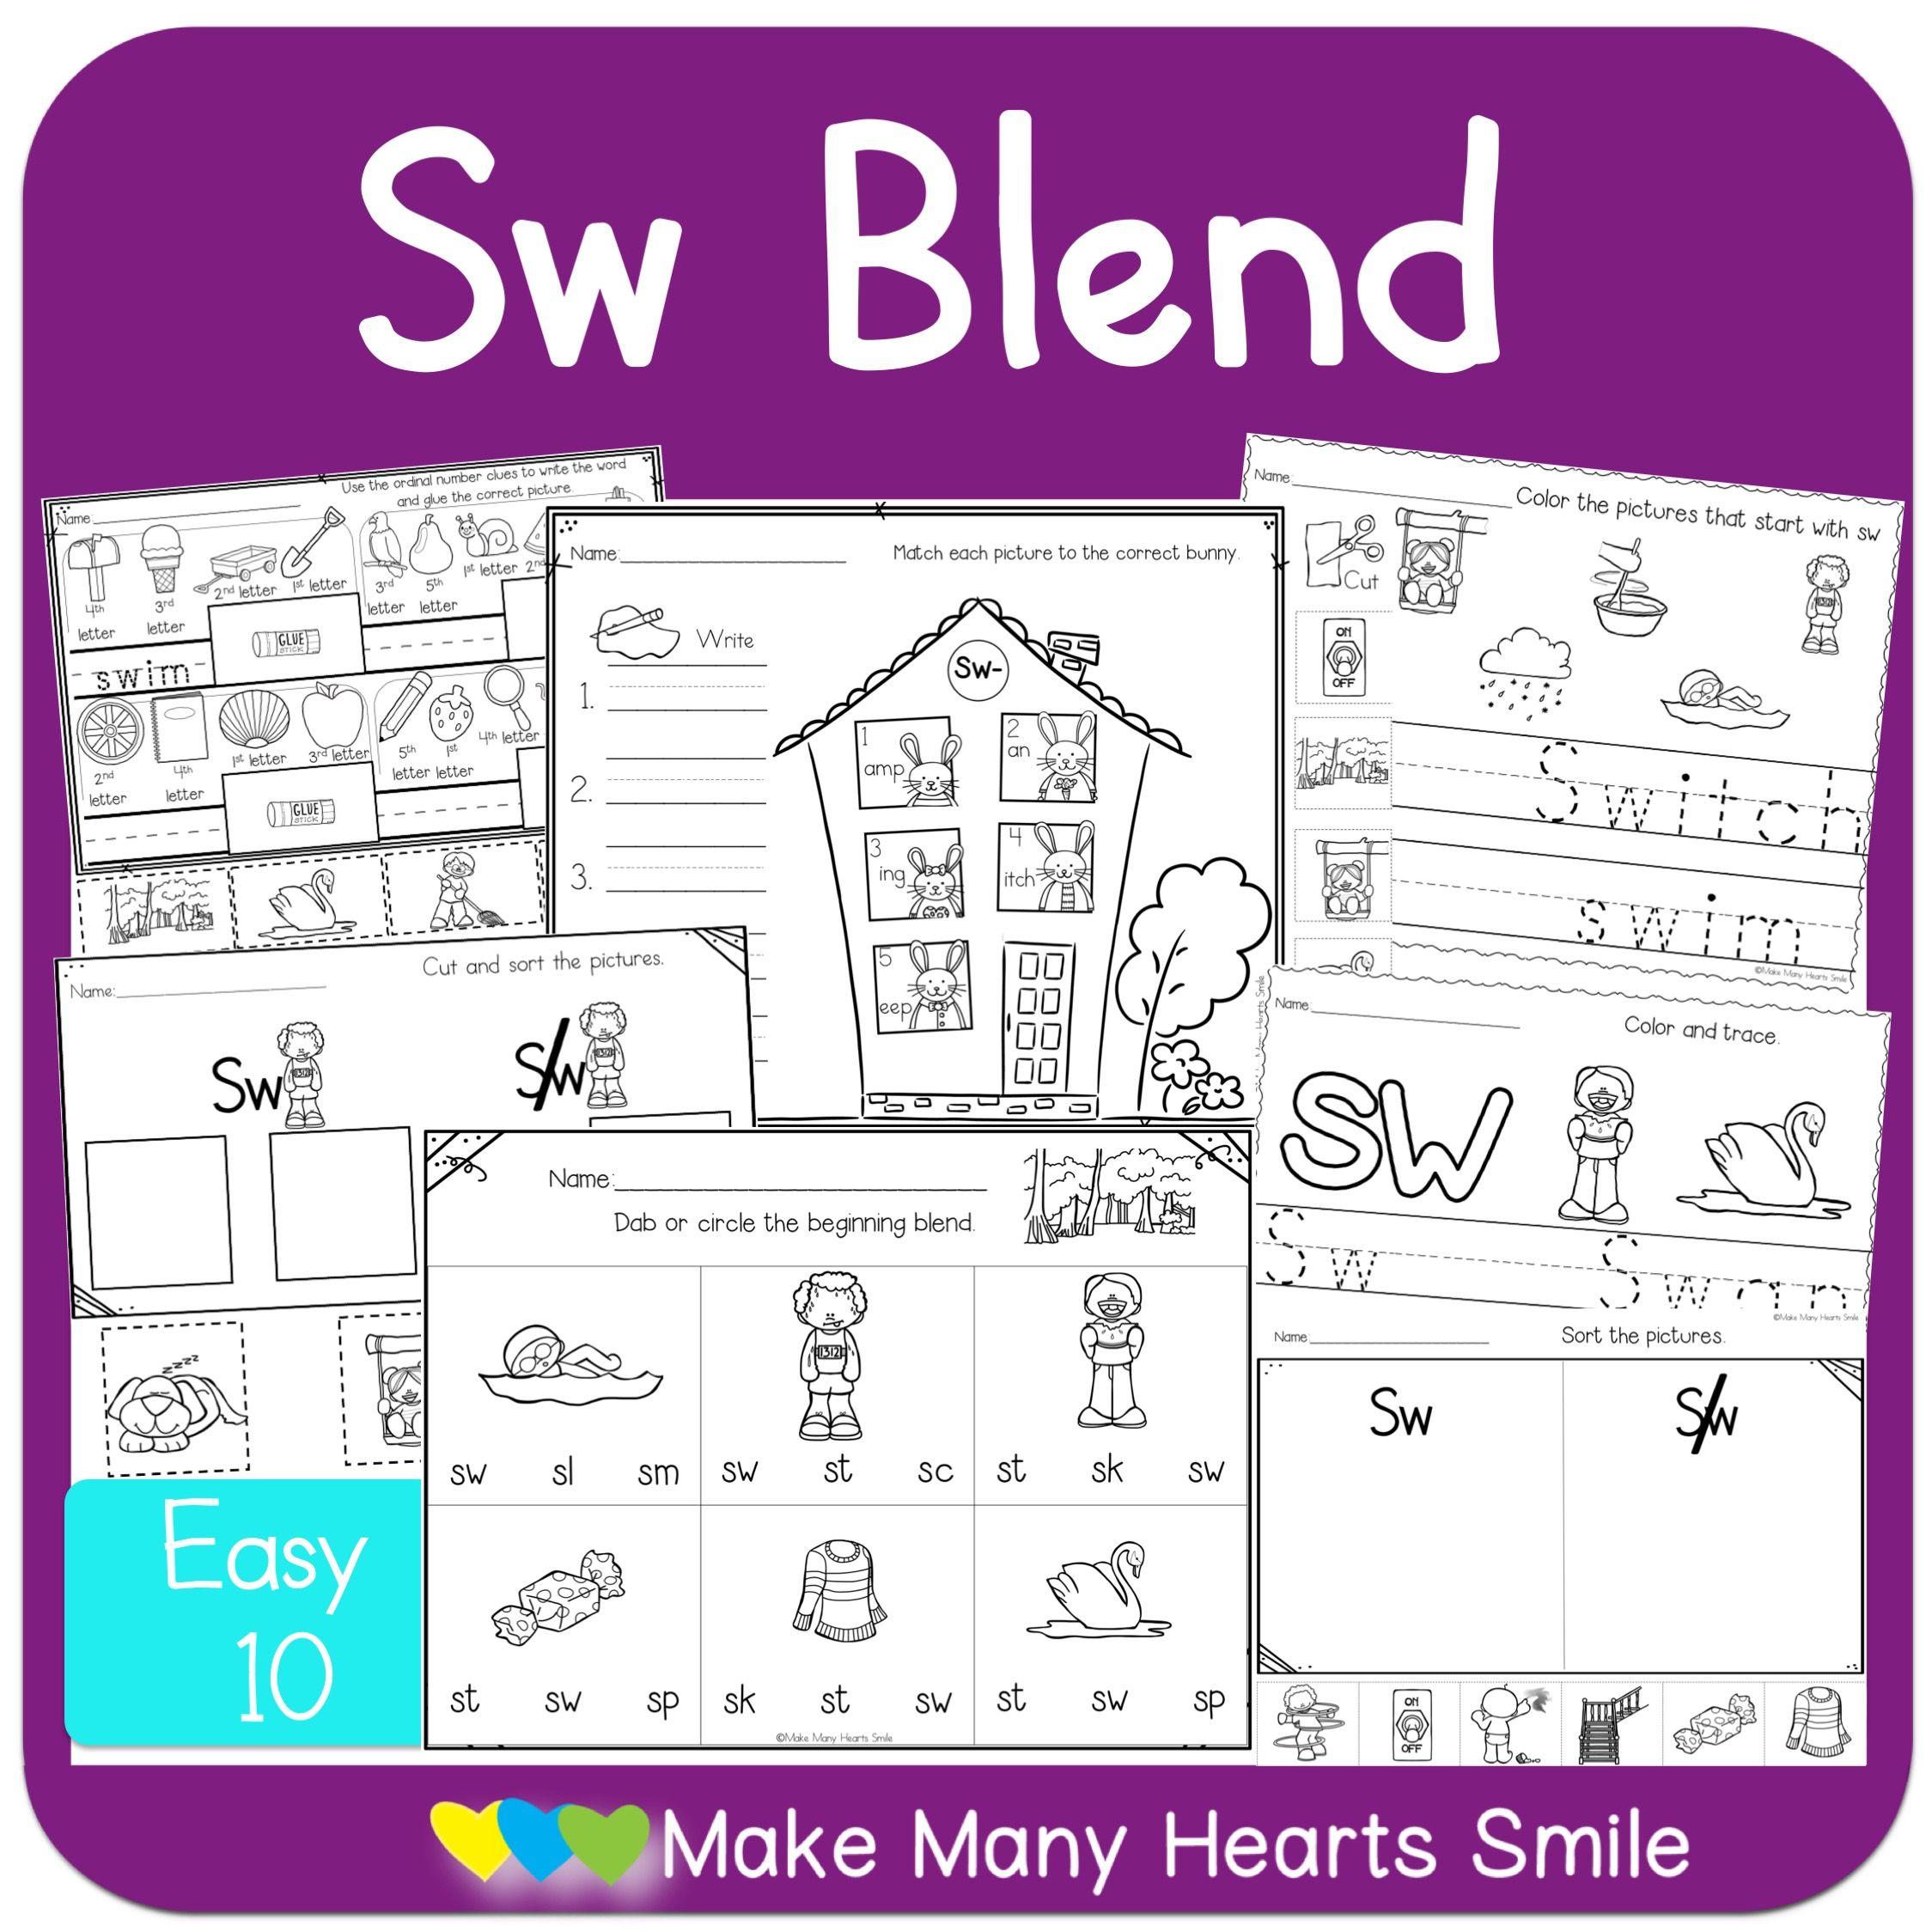 Sw Blend Fun Worksheets